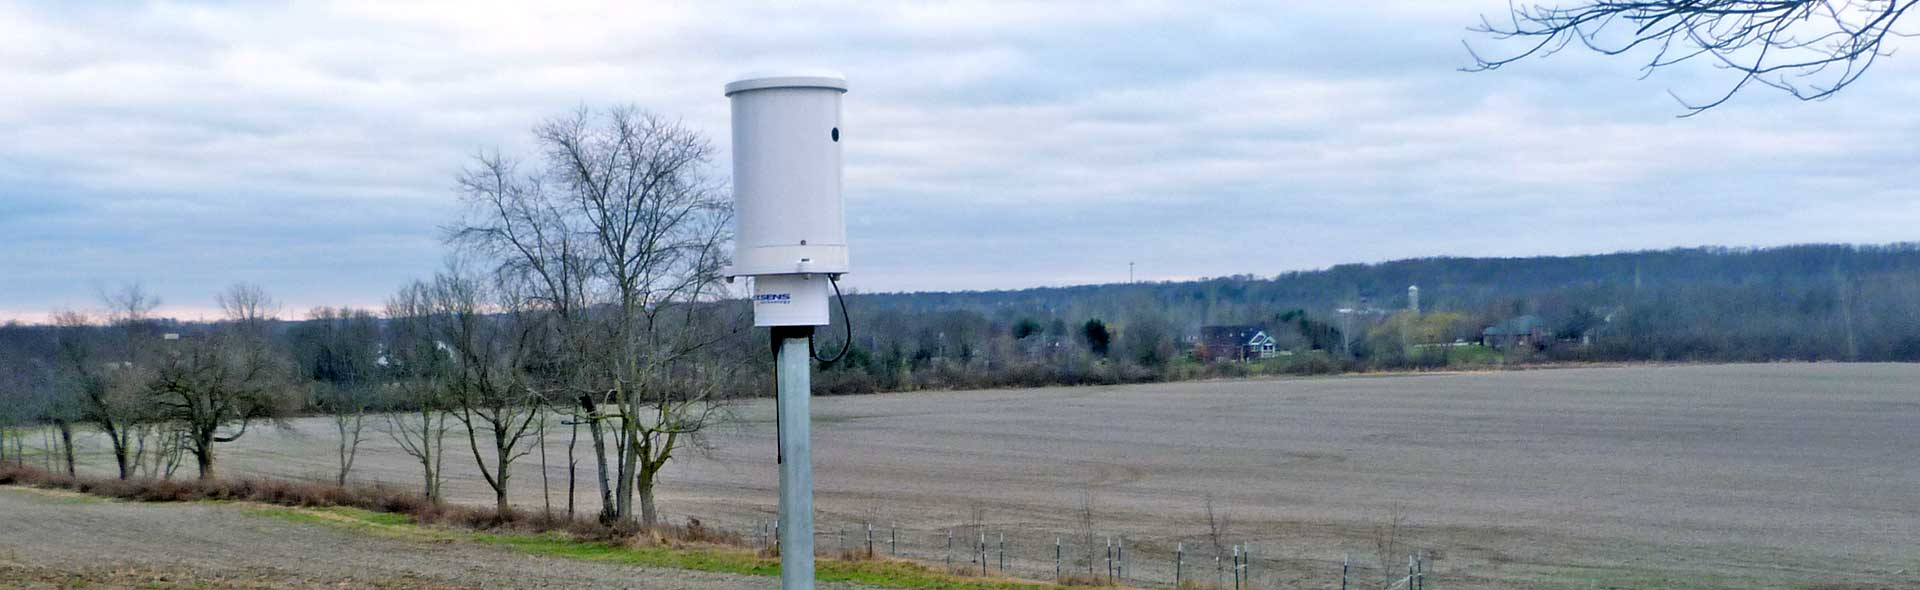 G2-RAIN Alert System